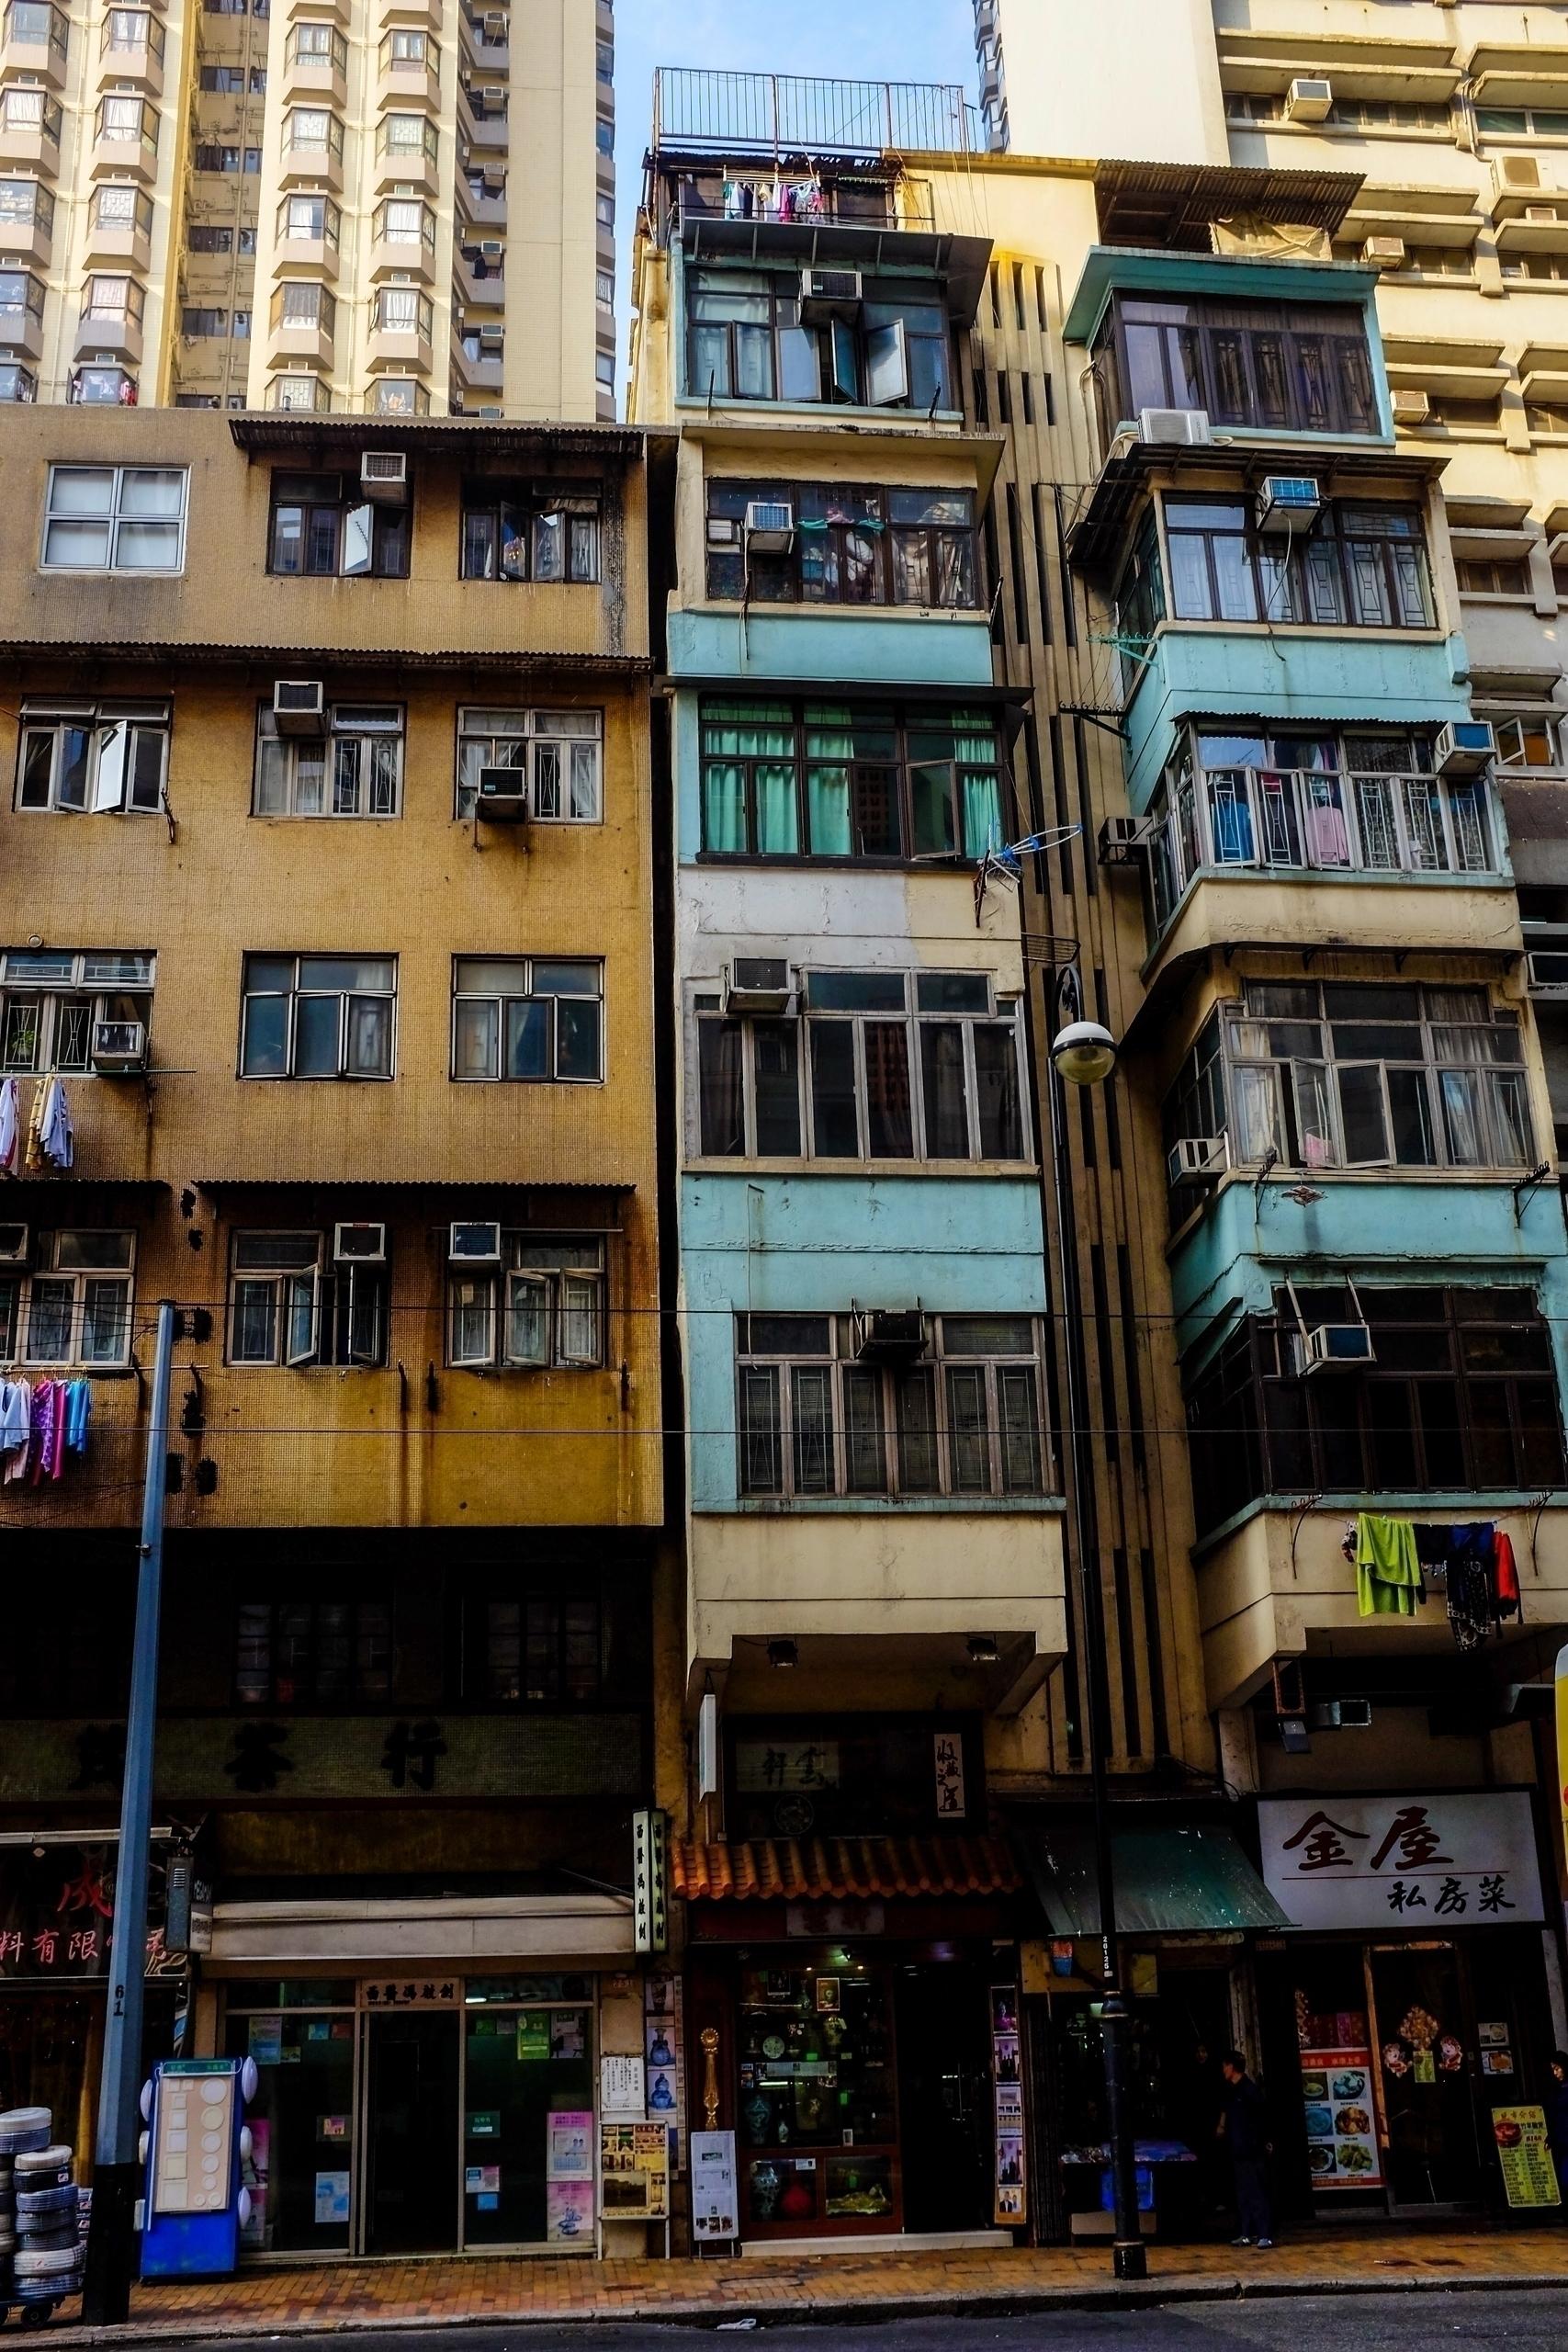 remaining buildings Hong Kong - photography - johnnyg_photography | ello